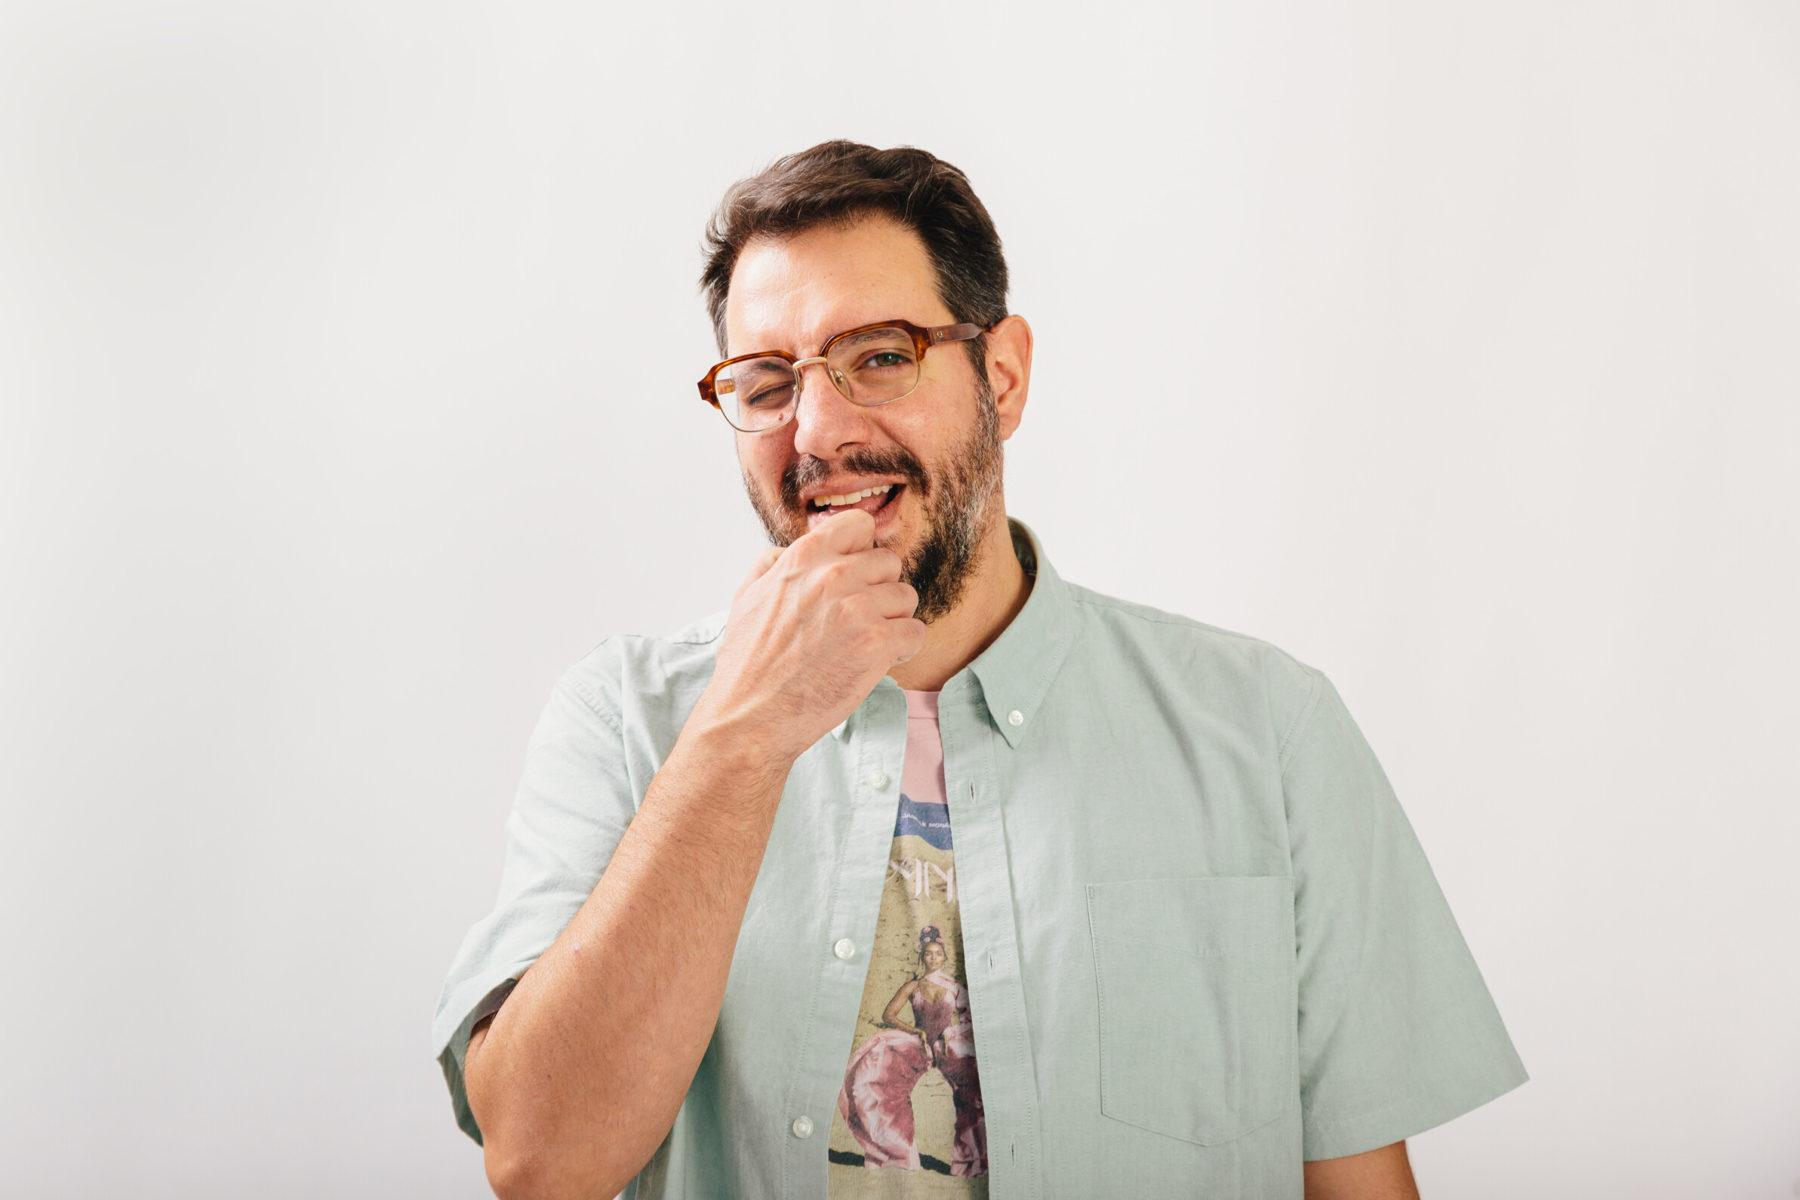 Masterchef - Παύλος Χάππιλος: μαθήματα εμβολιασμού μέρος δεύτερο